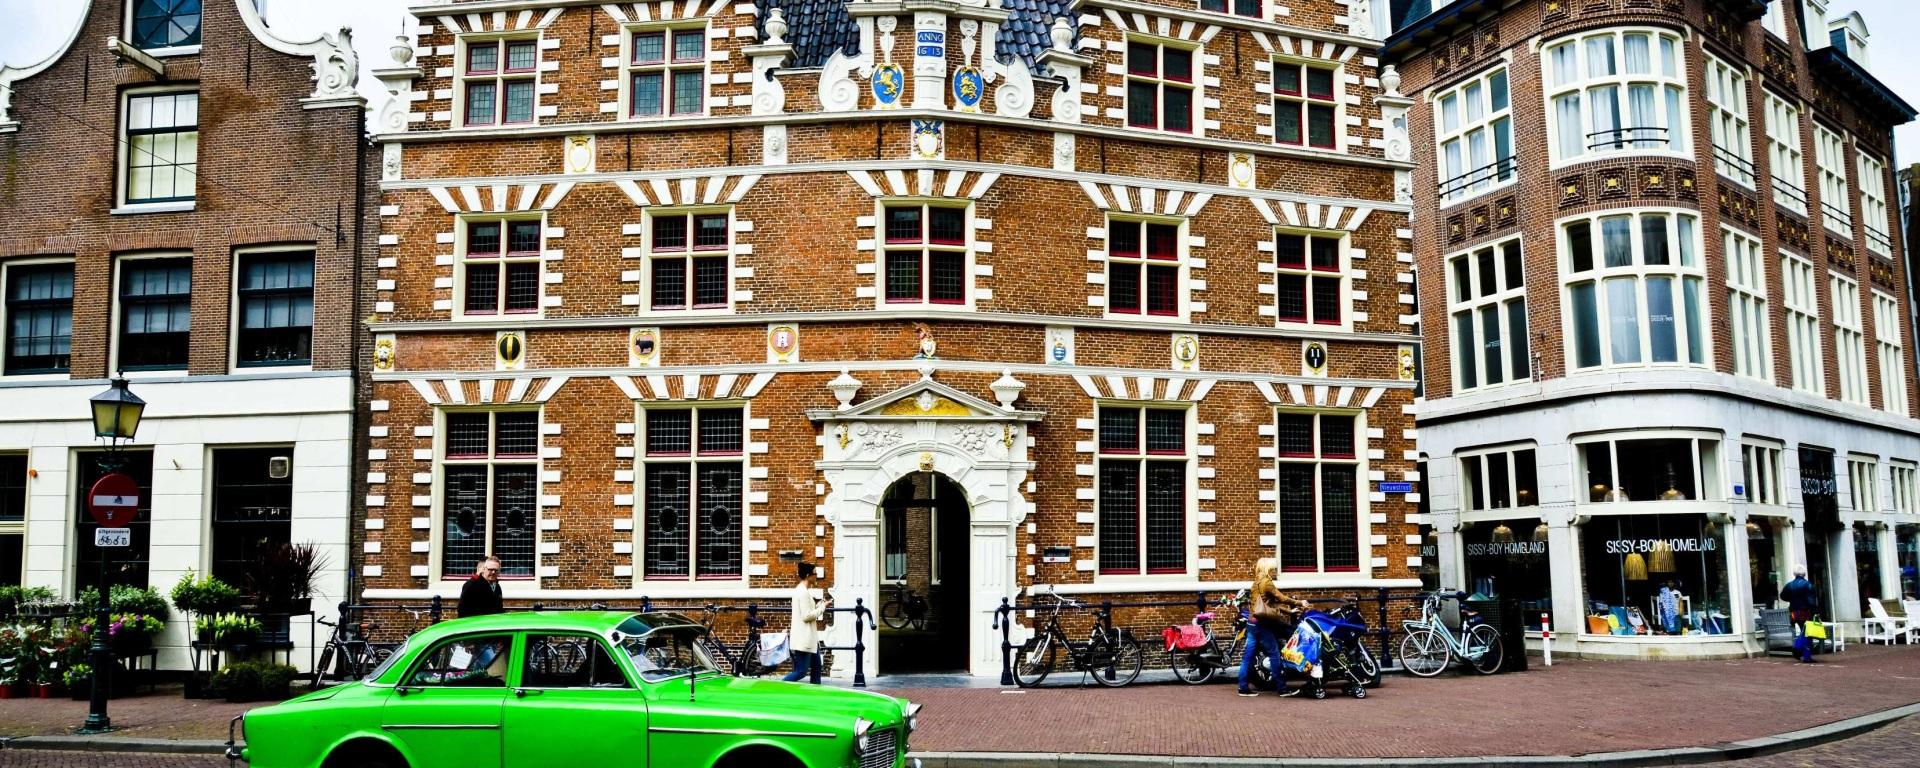 нидерланды, голландия, амстердам, европа, путешествия, люди, мир